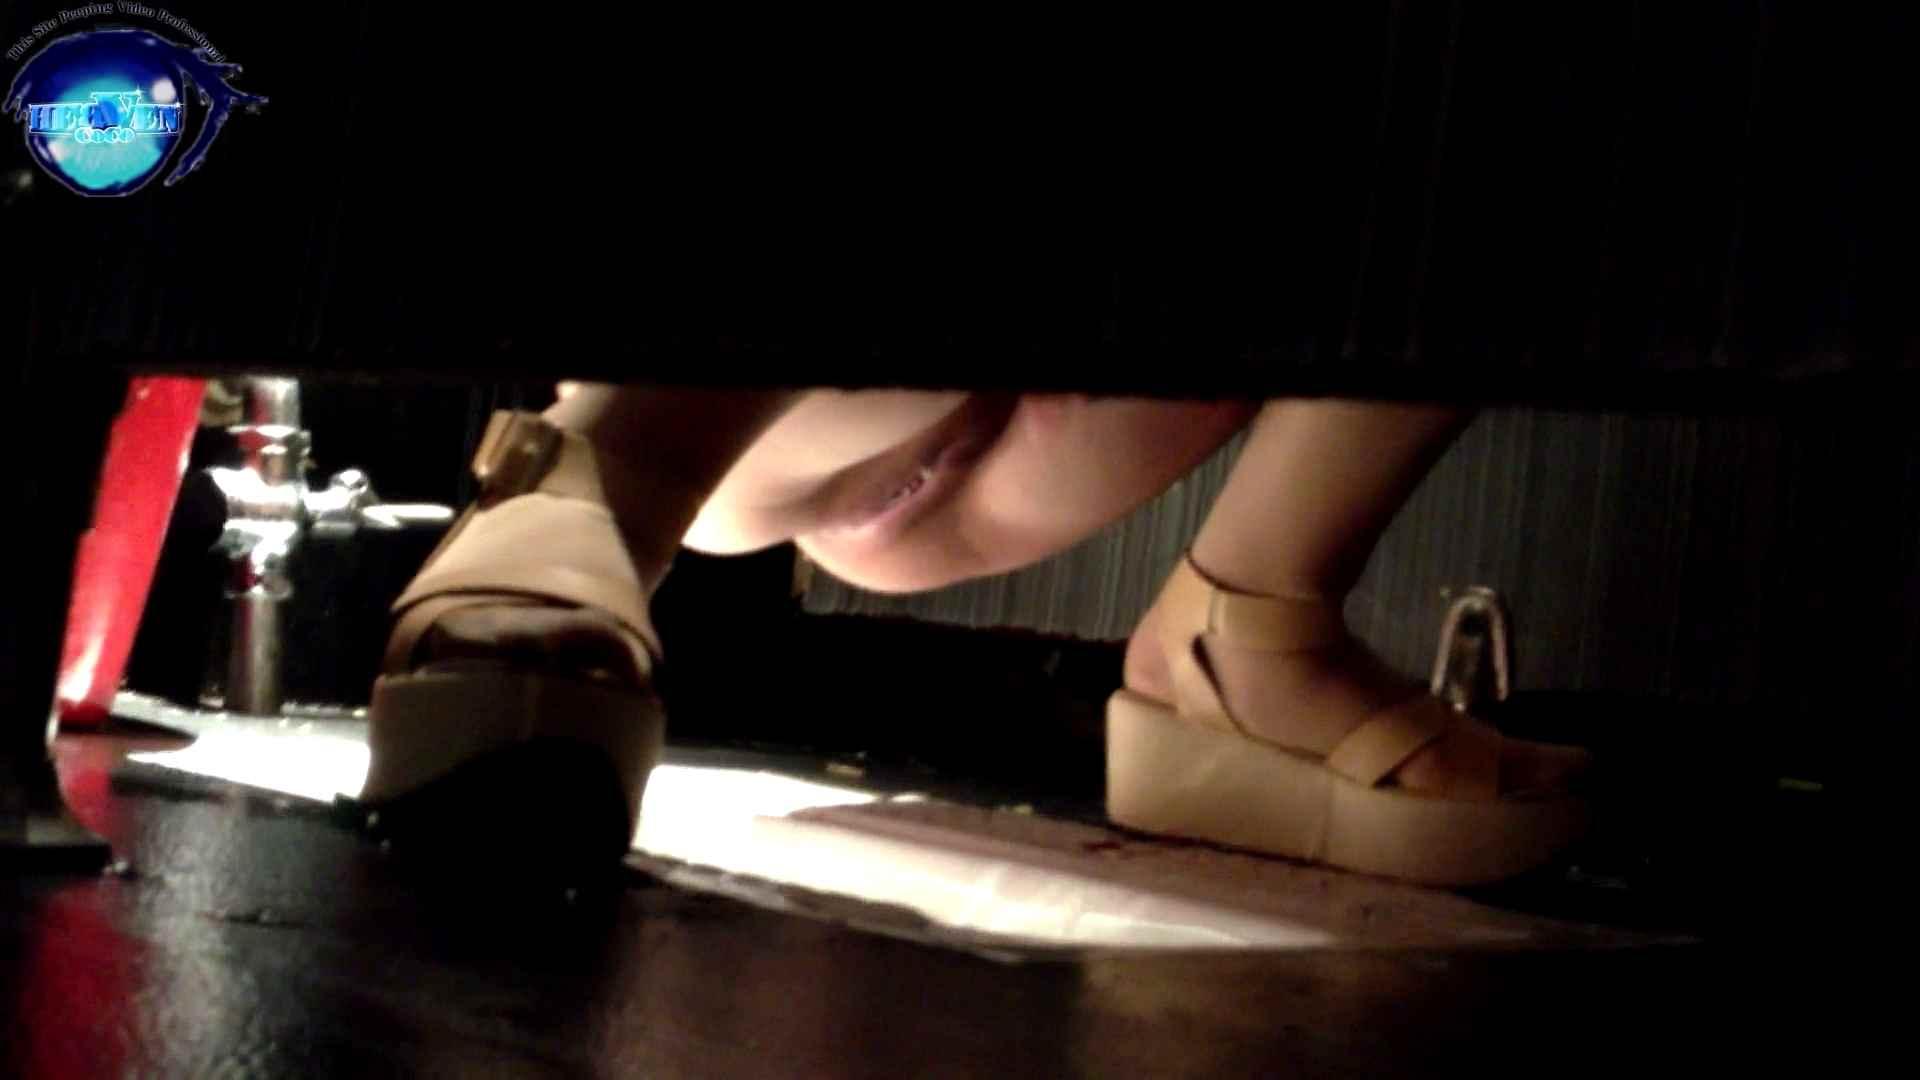 GOD HAND ファッションショッピングセンター盗撮vol.03後編 高画質 おまんこ無修正動画無料 96pic 50